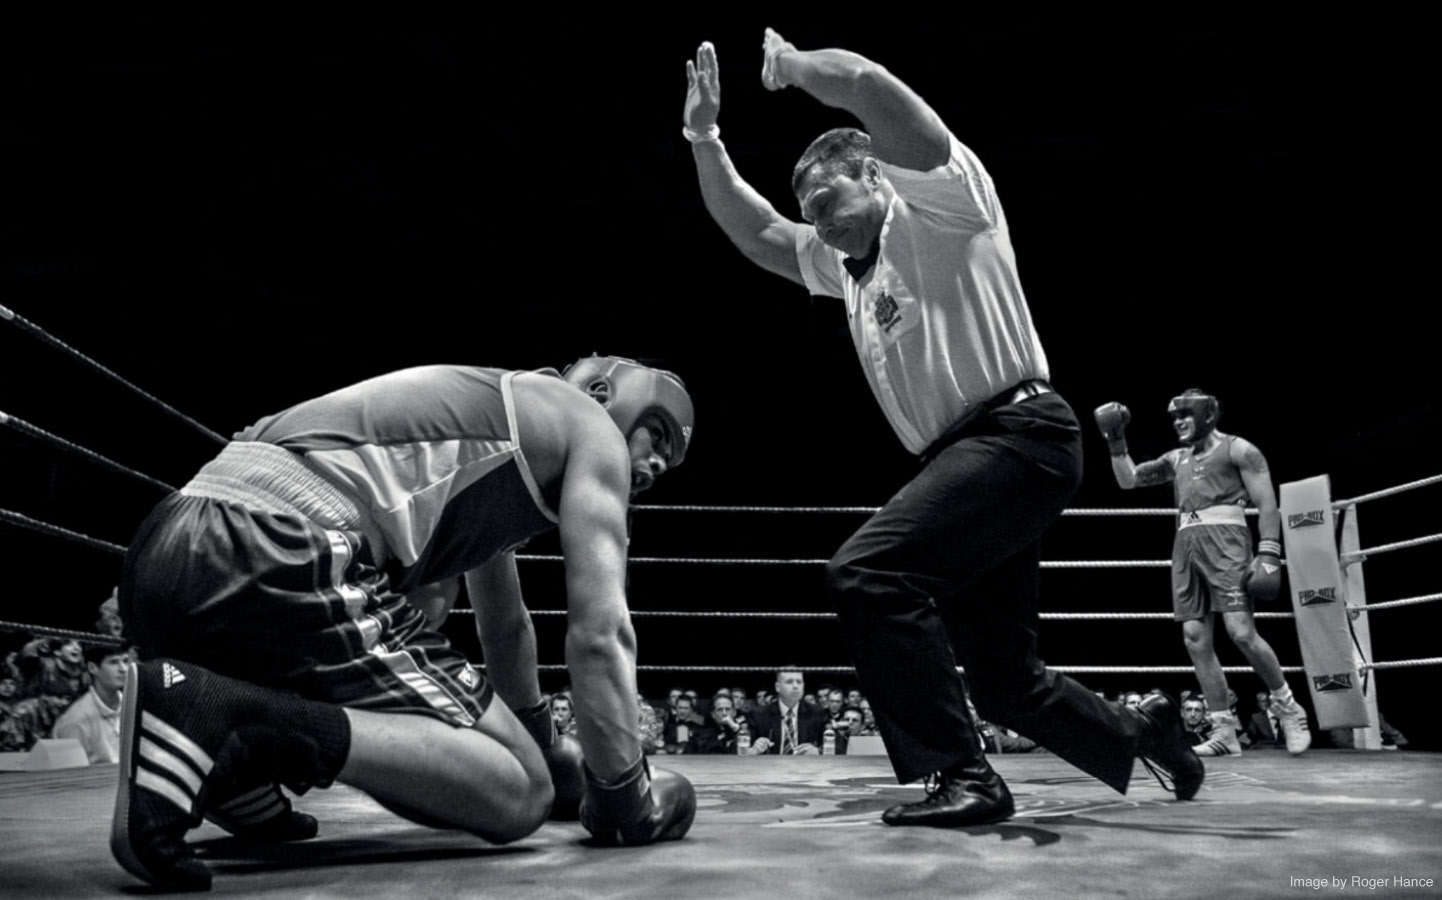 Sport Wallpaper Boxing: Boxing Wallpapers HD